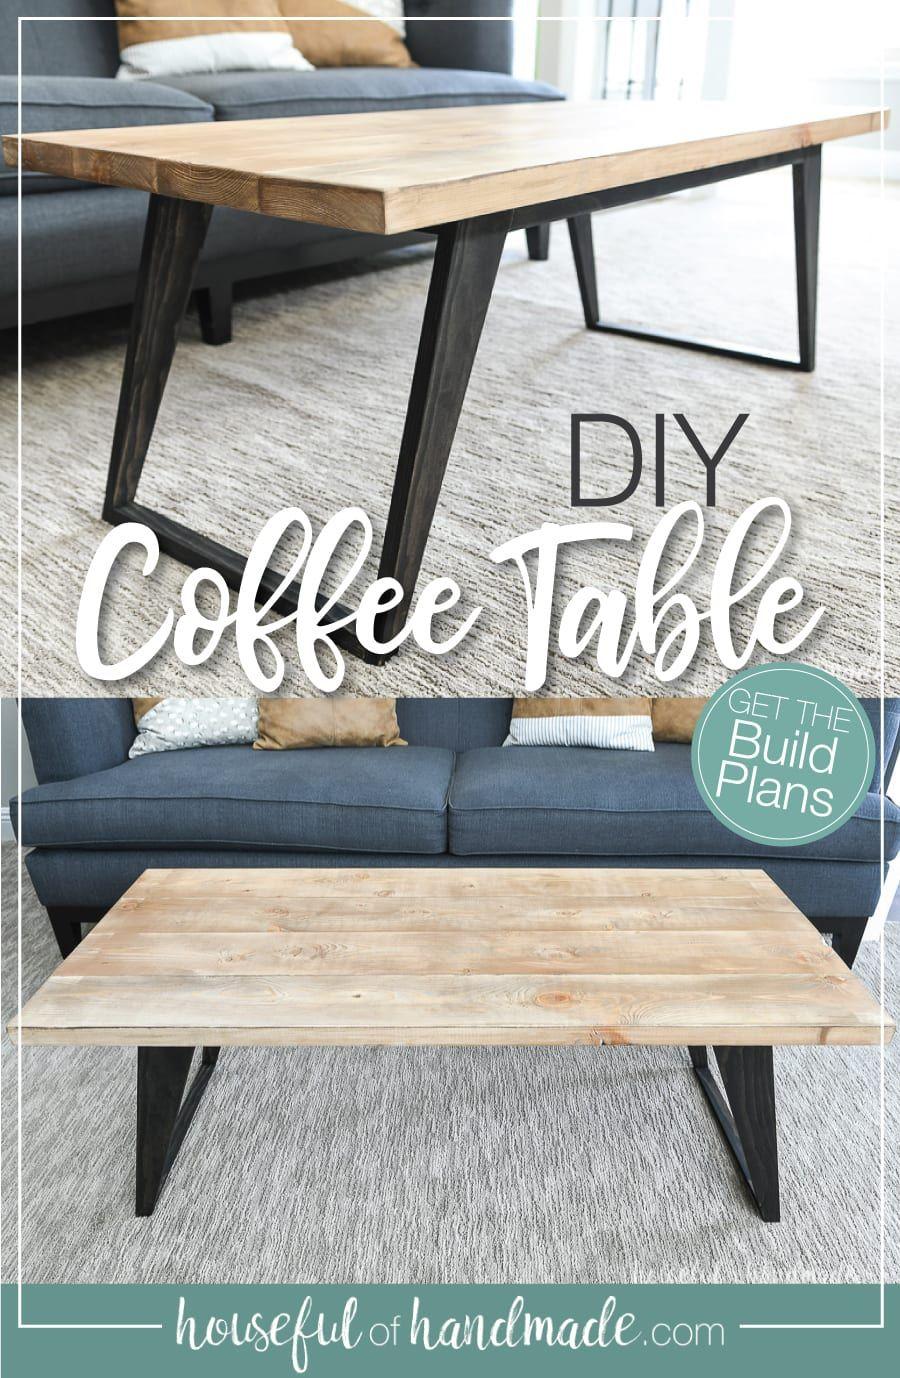 Simple Modern Coffee Table Build Plans In 2020 Wood Coffee Table Diy Diy Coffee Table Coffee Table Plans [ 1378 x 900 Pixel ]